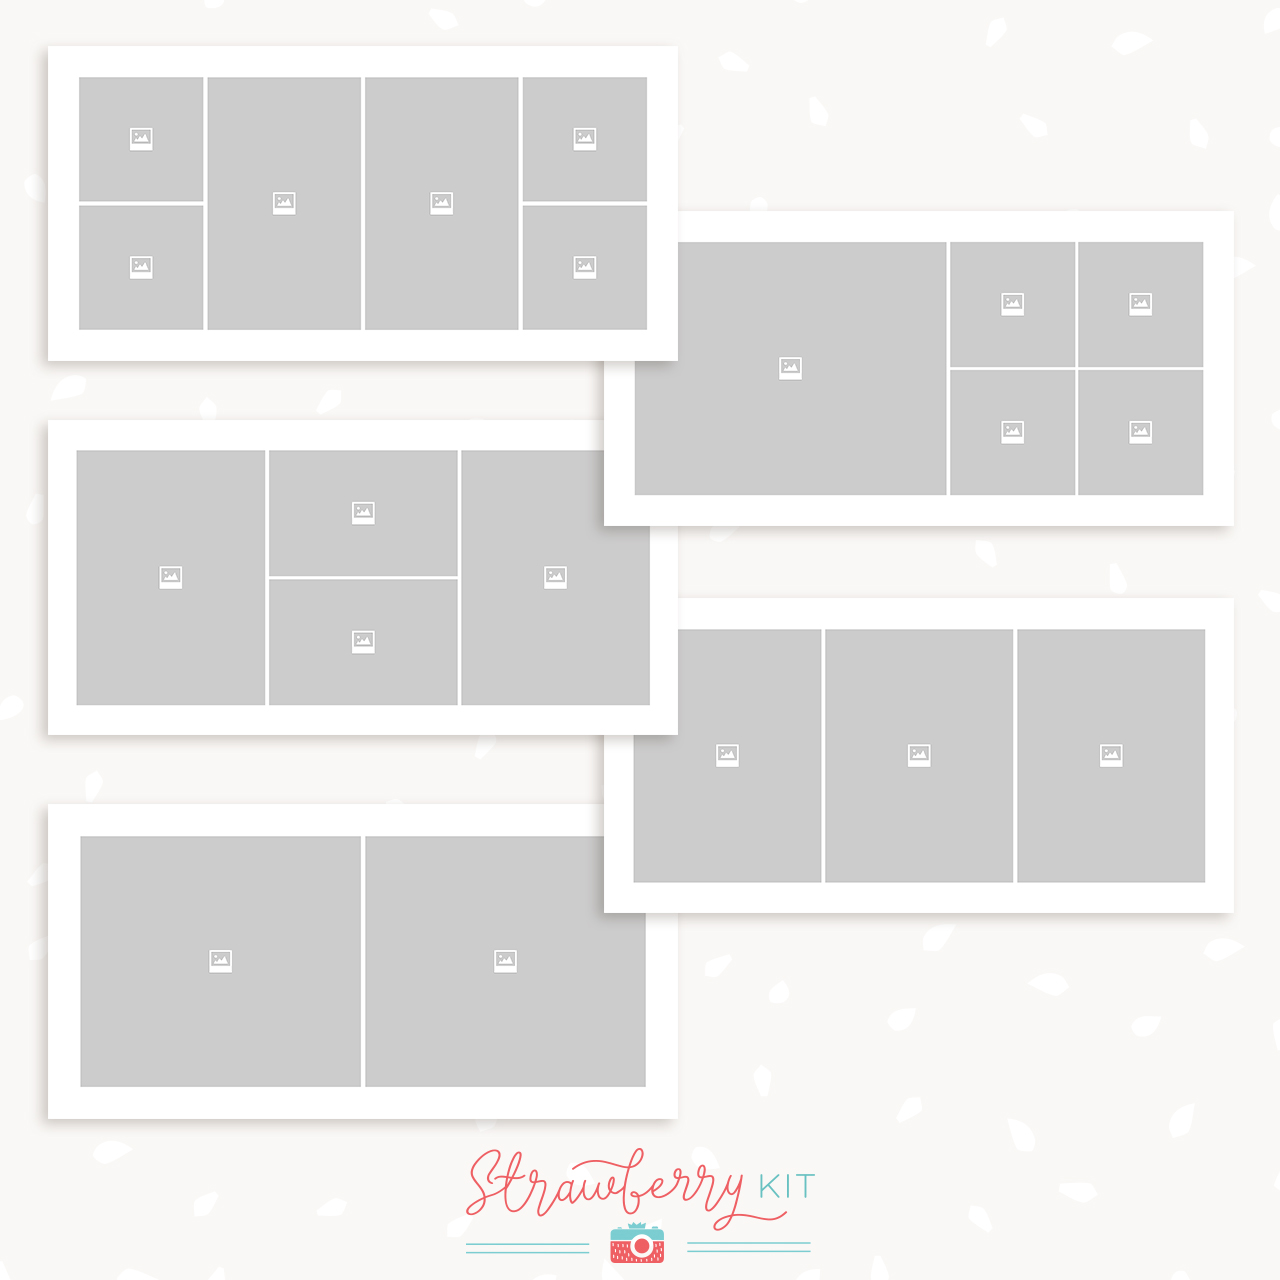 20 x 10 storyboard templates